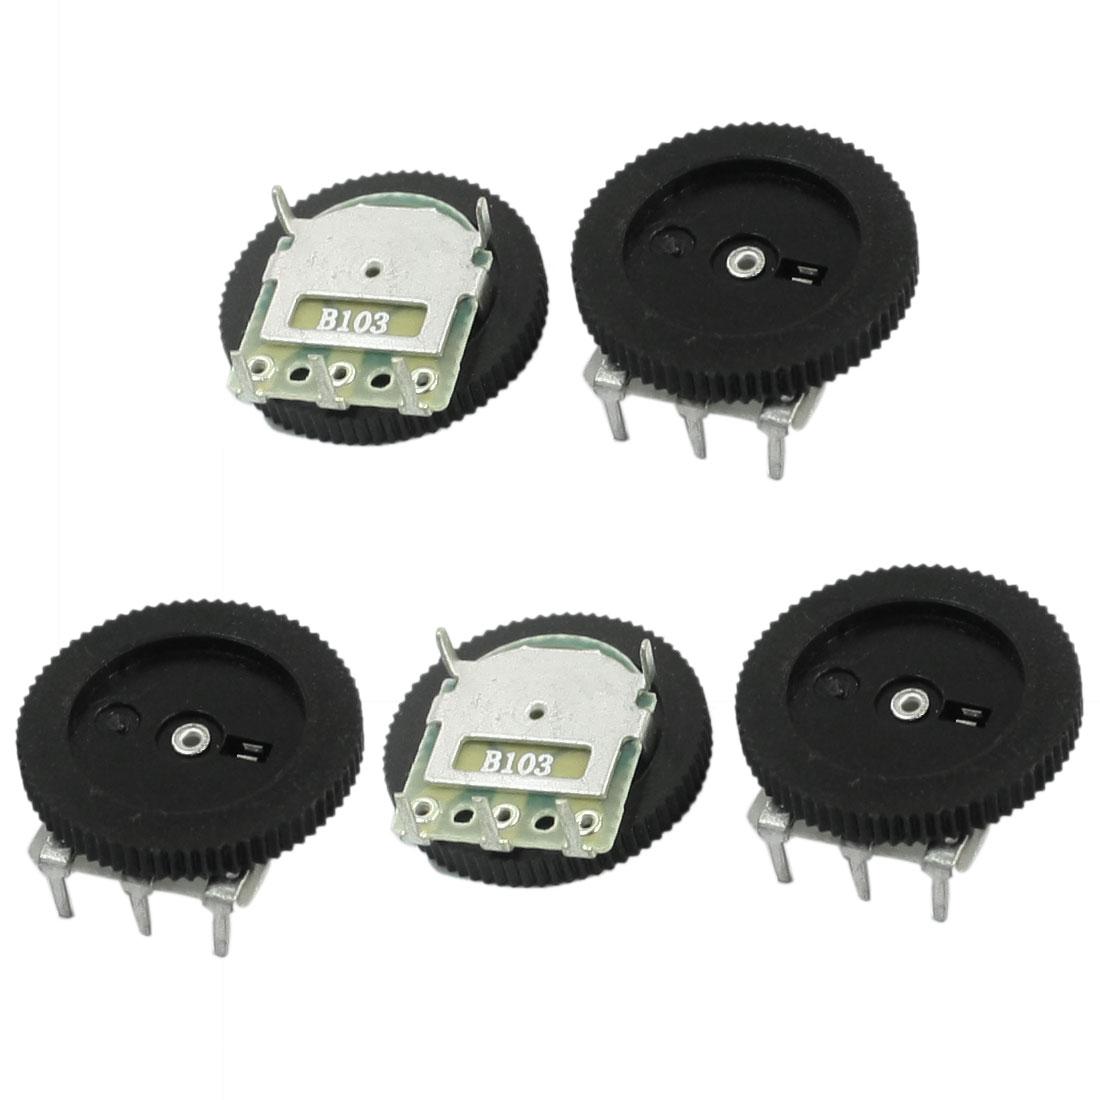 UXCELL 5 Stücke 16 Mm x 2mm 10 Karat Ohm Stereo Radio Lautstärkeregler Rad Potentiometer B103